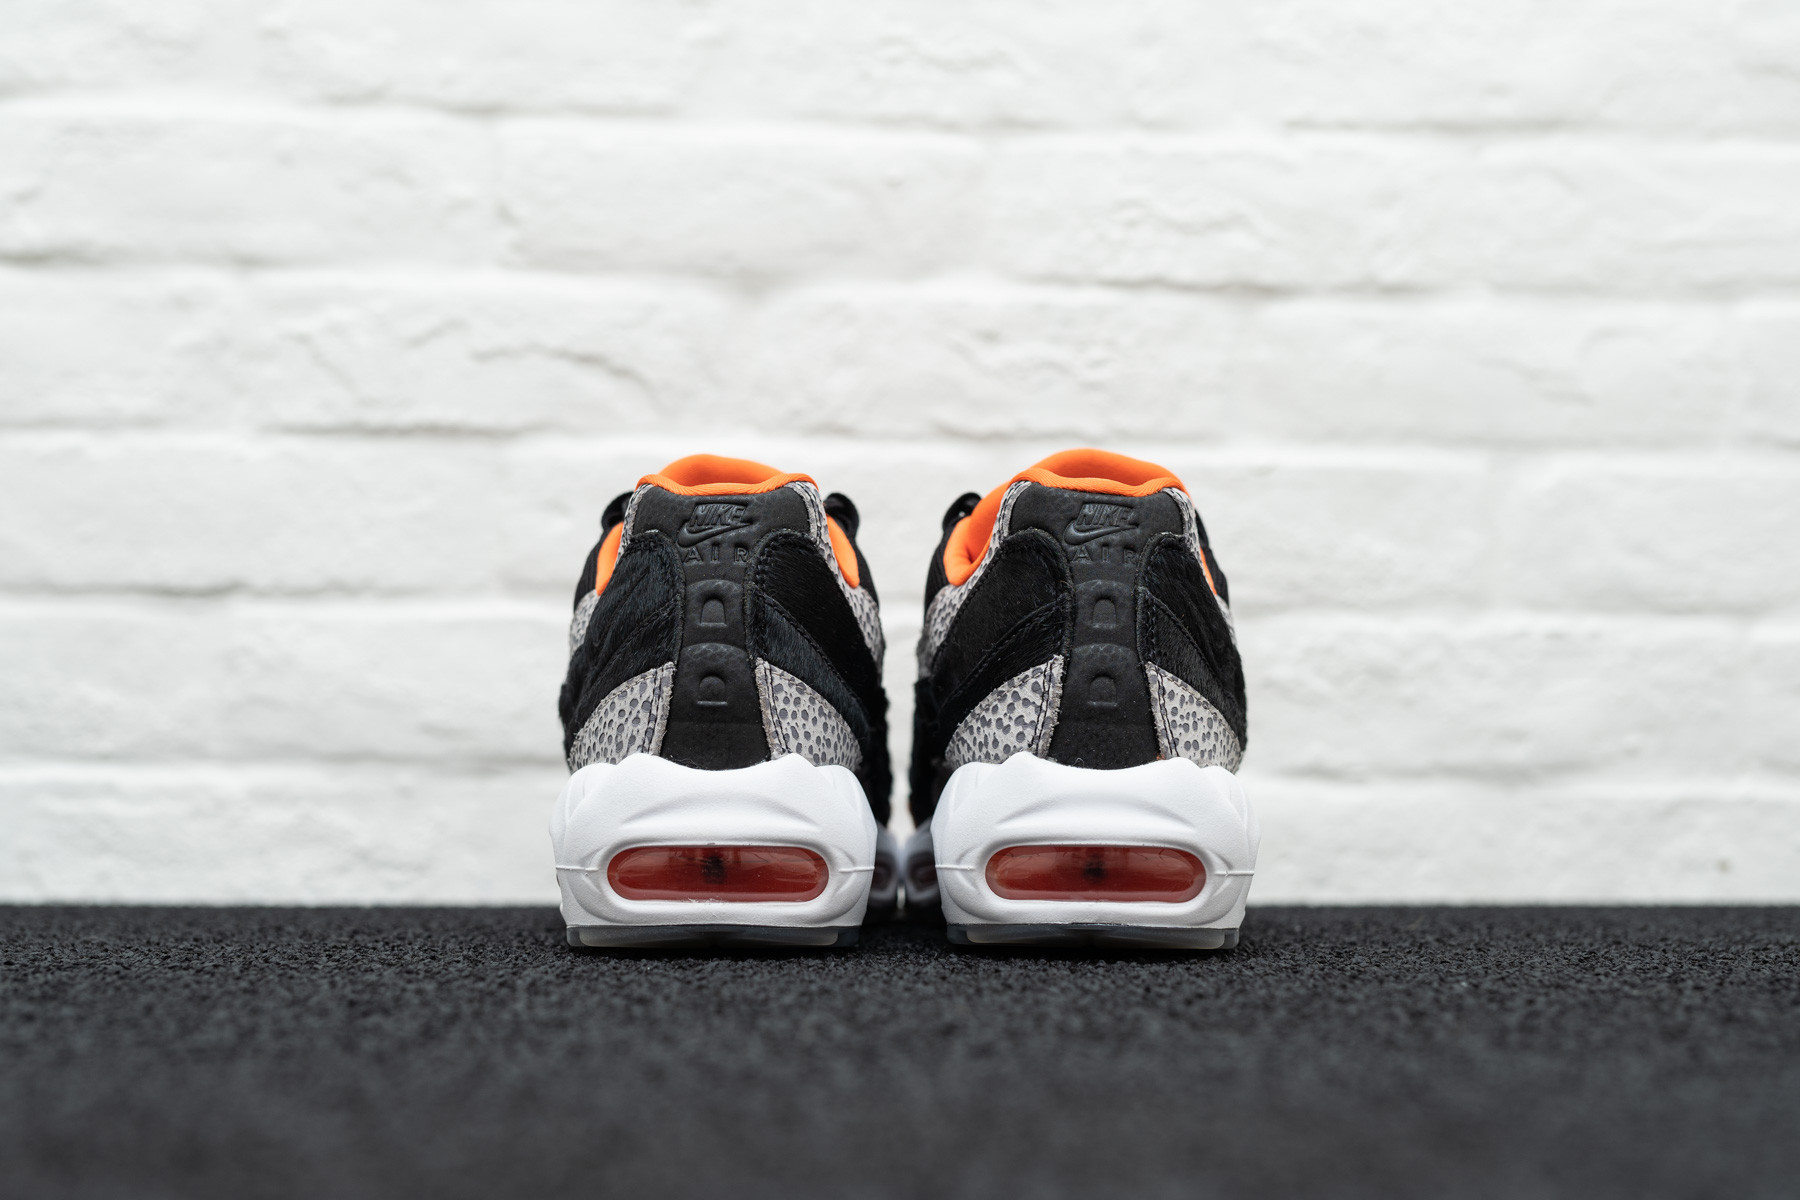 Nike Air Max 95 Herre Sneakers Sneaker.no